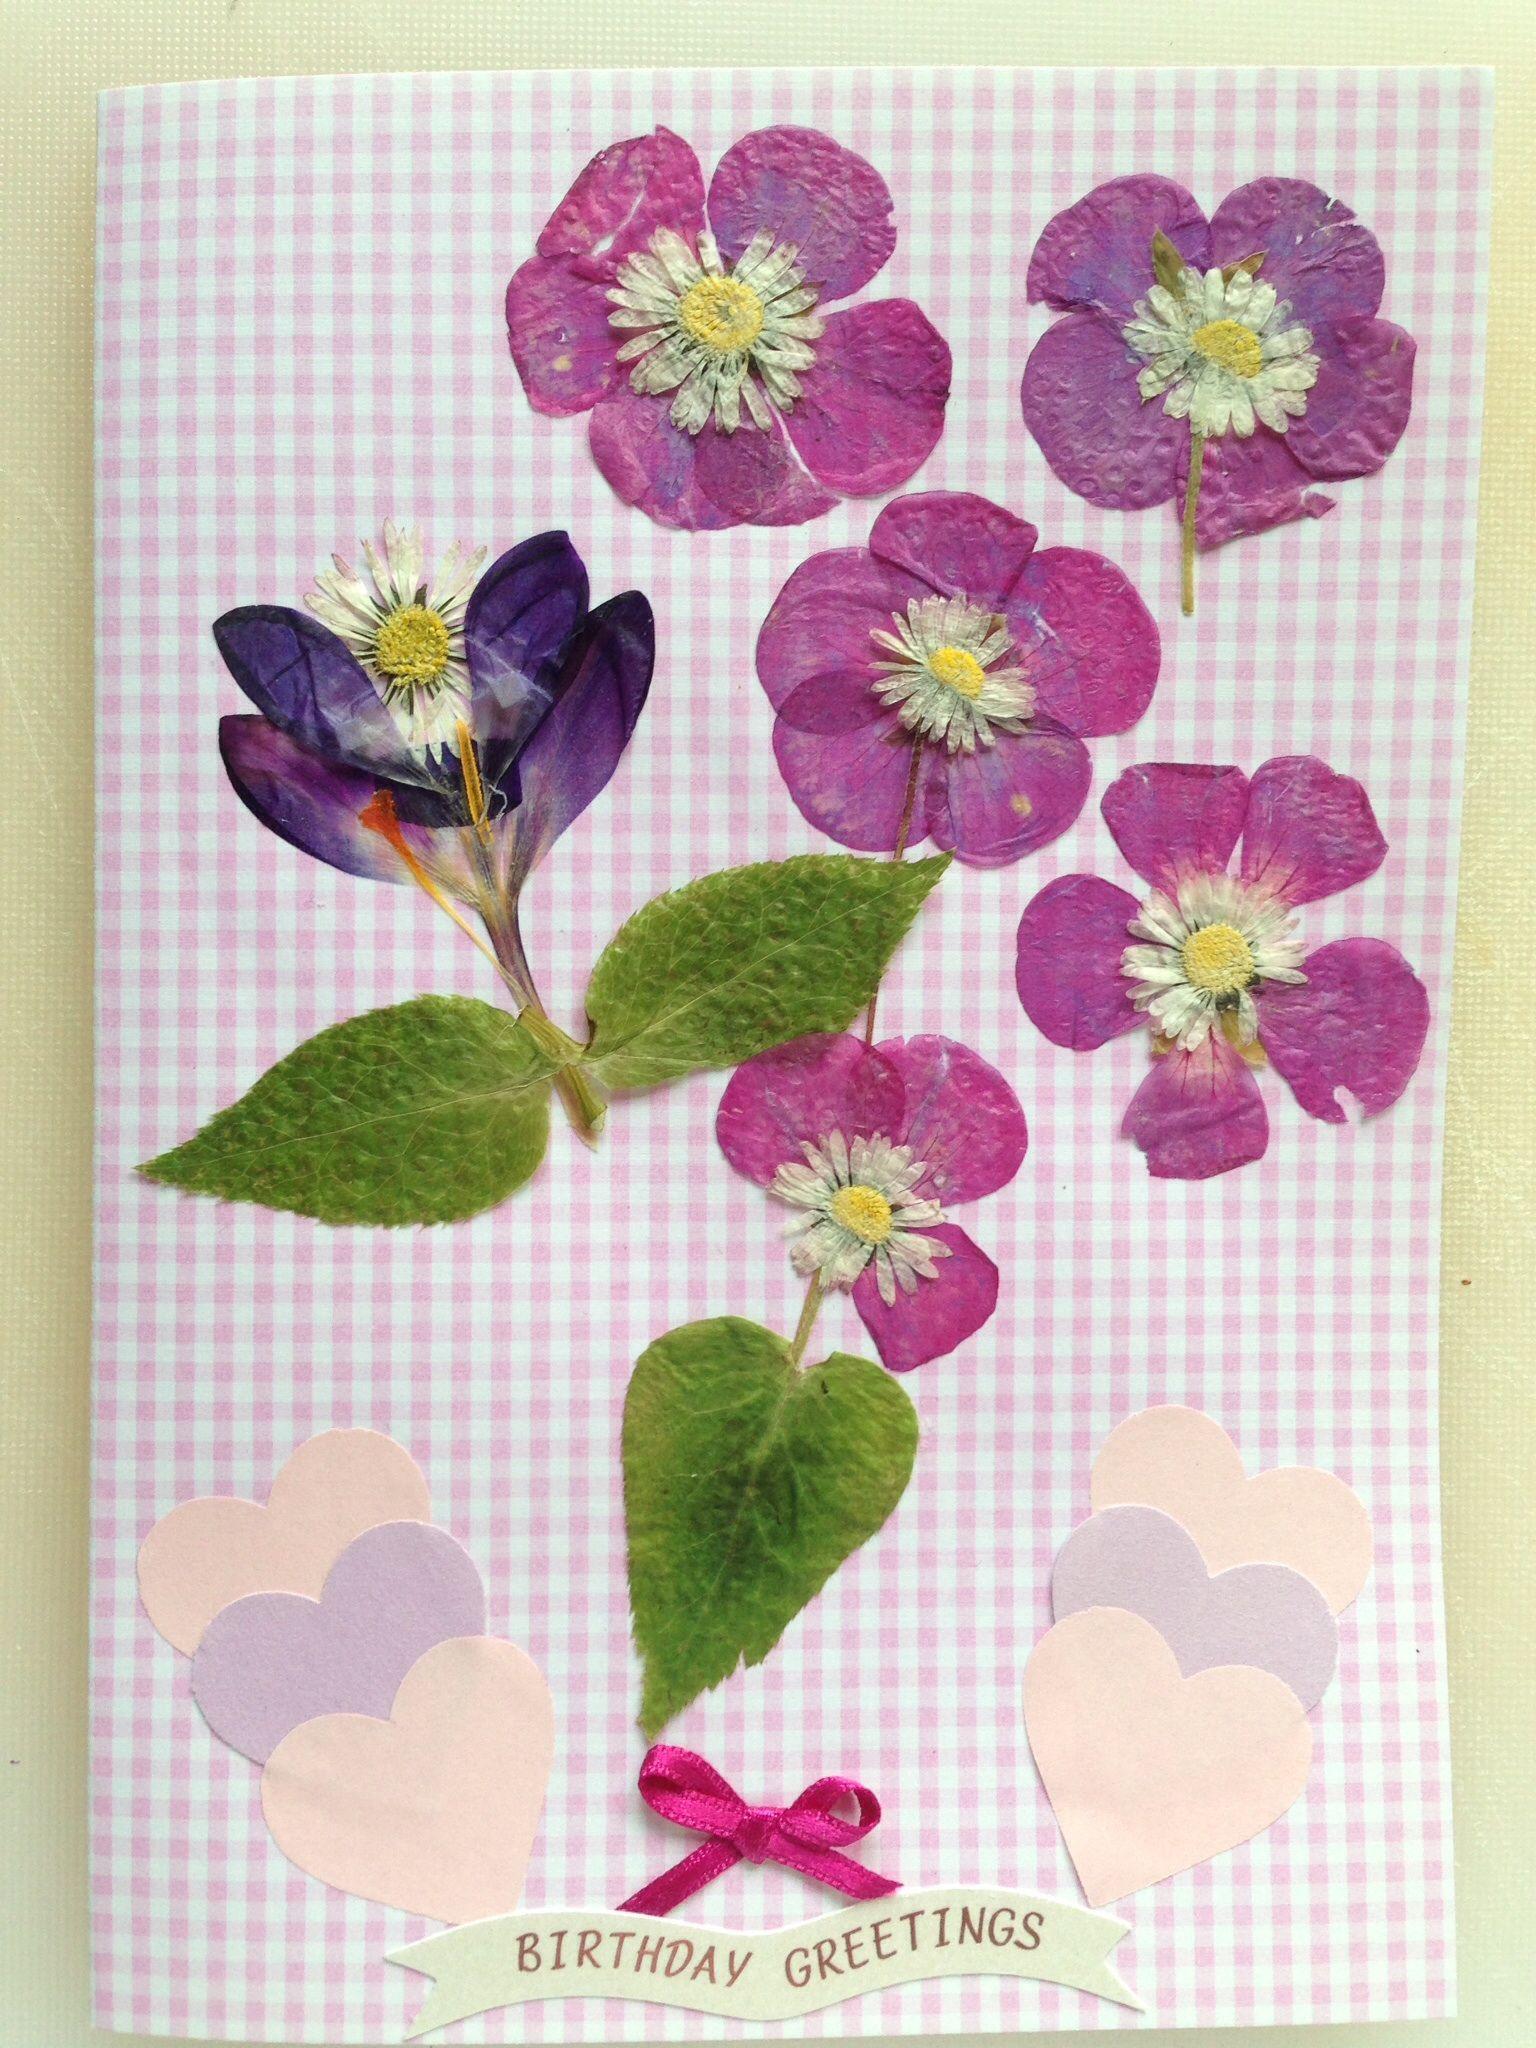 Fresh pressed flowers for a birthday card cards i have made fresh pressed flowers for a birthday card izmirmasajfo